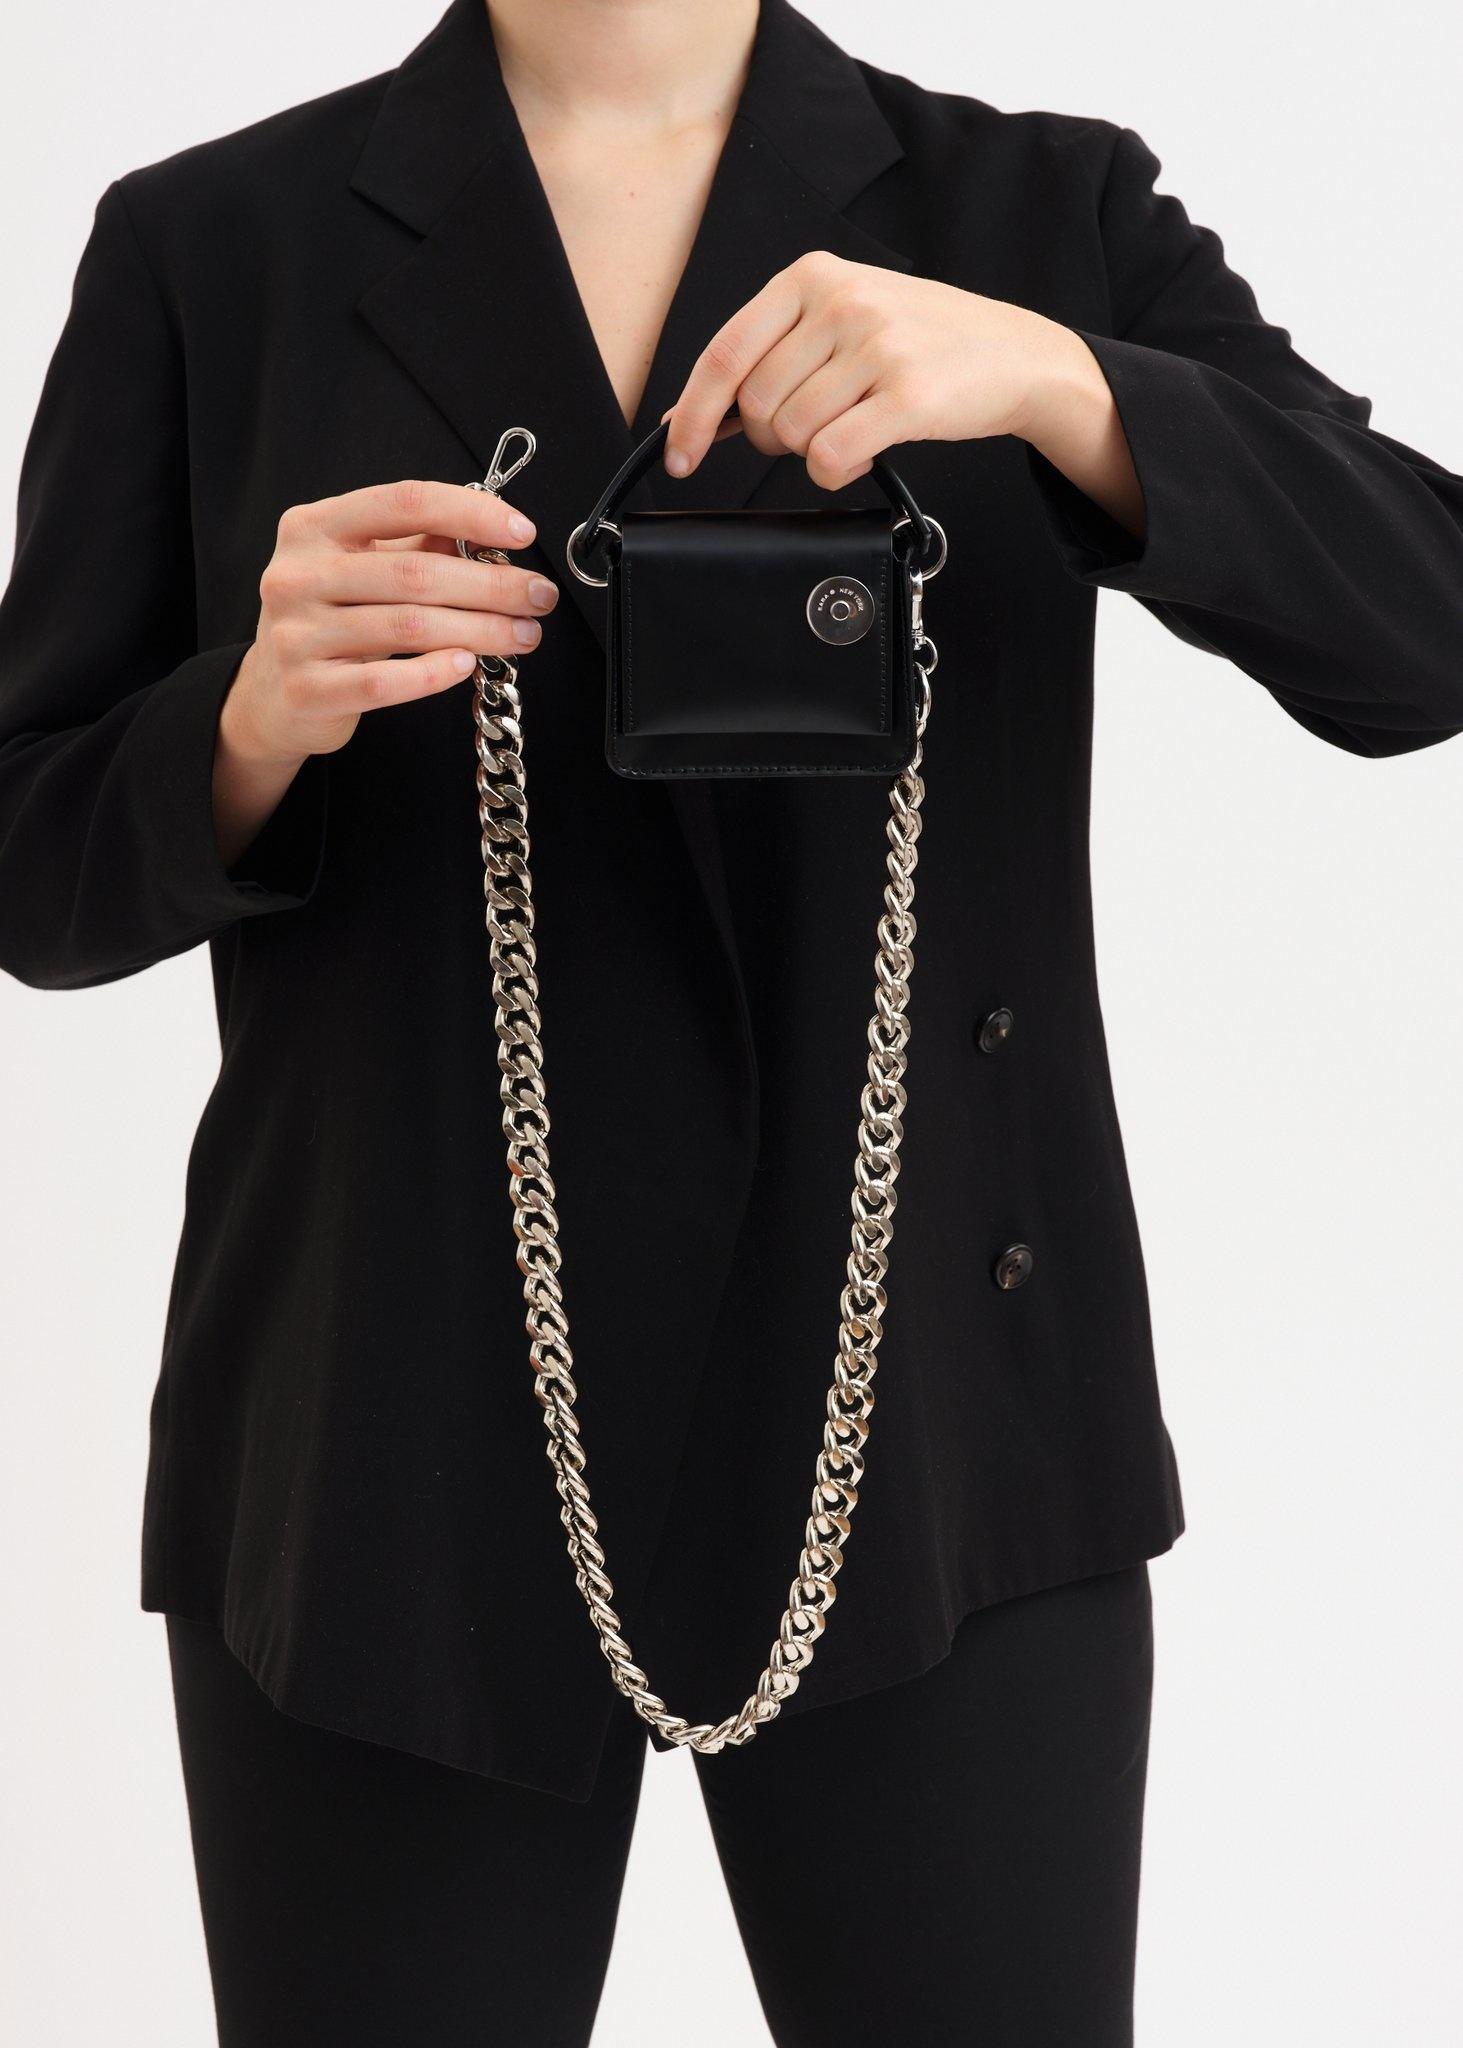 KARA MICRO PINCH MINI BAG IN Black